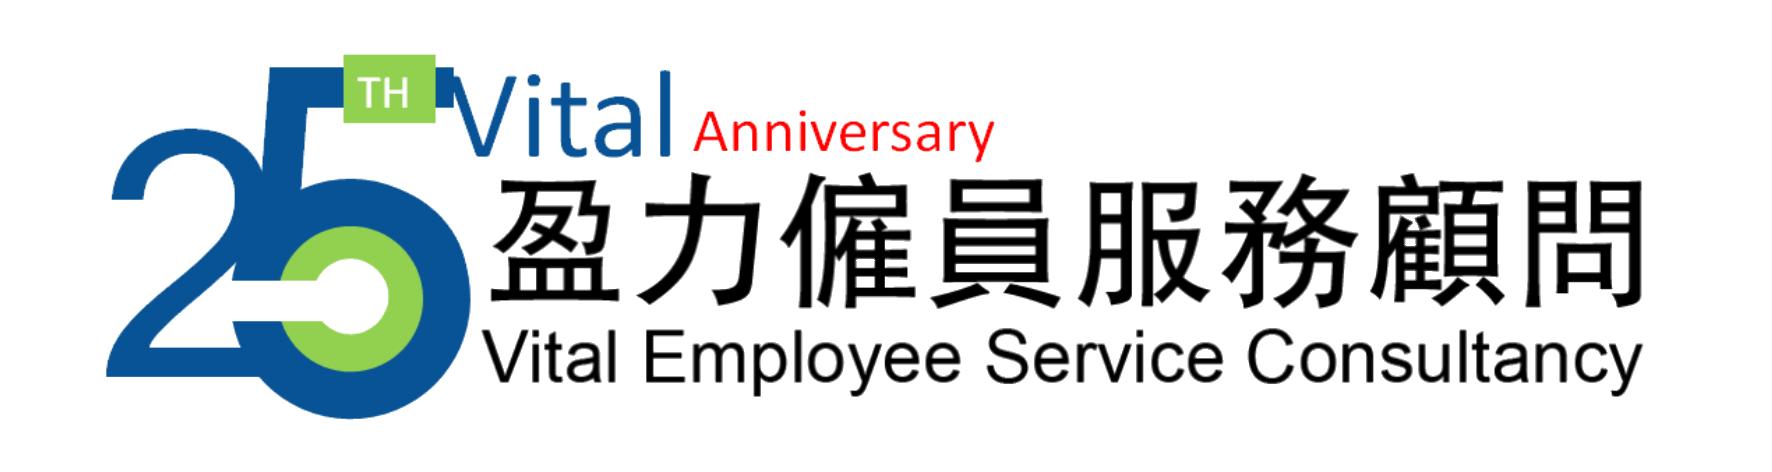 盈力僱員服務顧問 vital employee service consultancy home